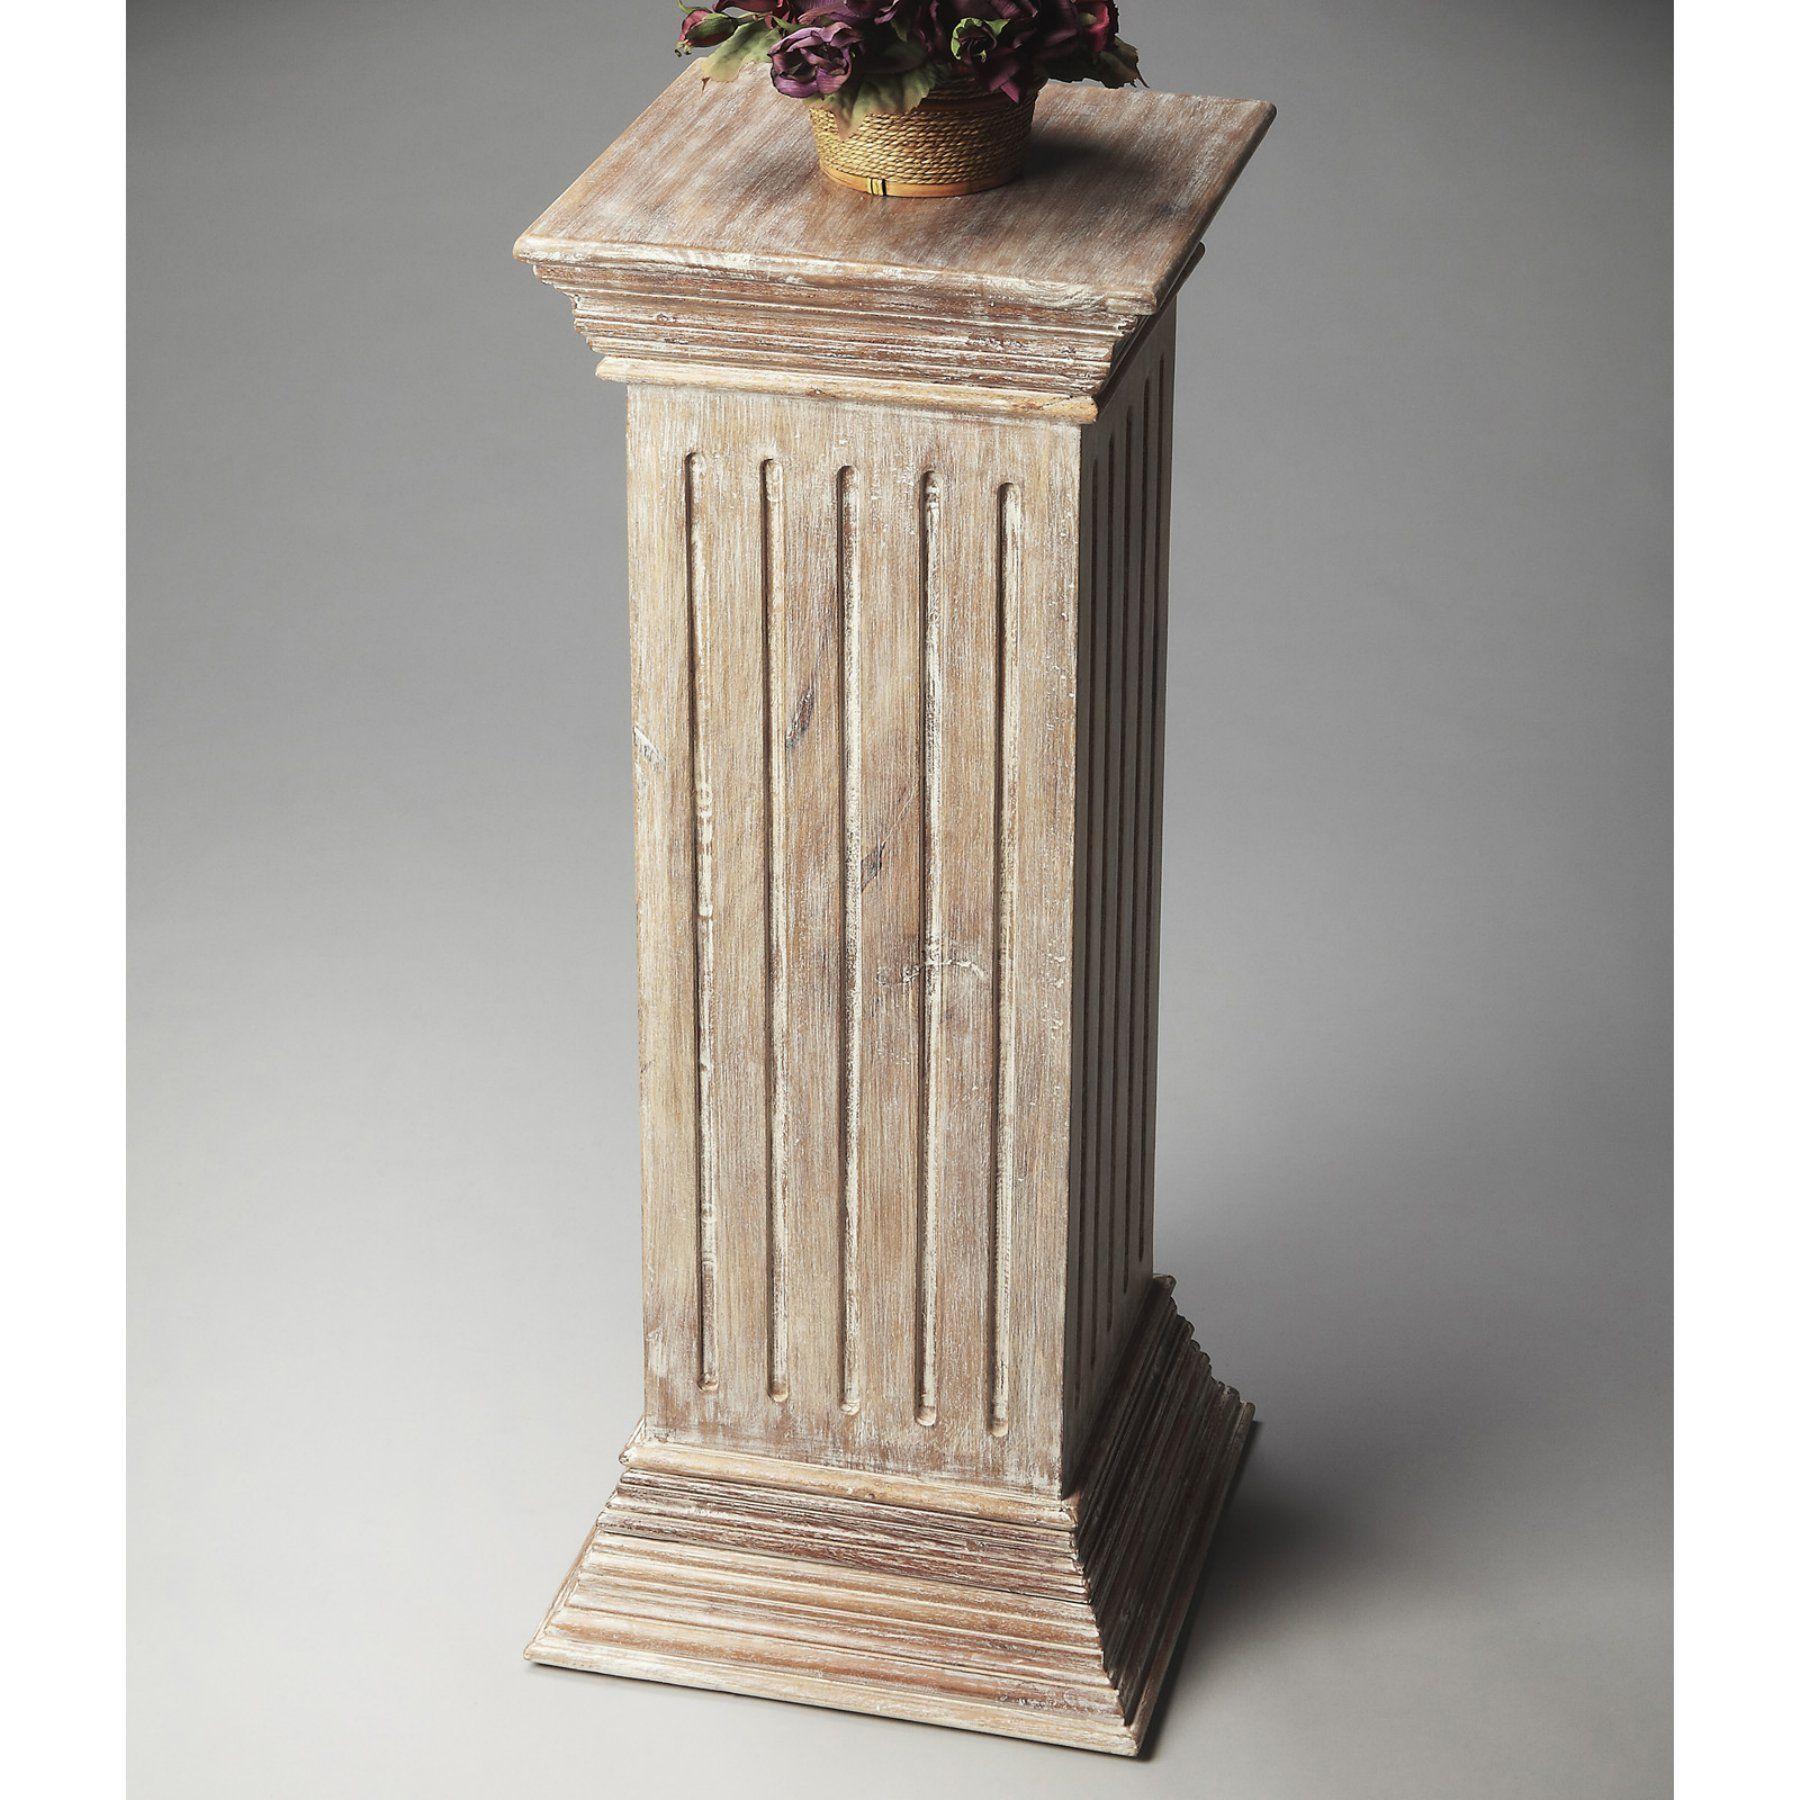 Butler Grecian Pedestal Plant Stand Plant Stand Plant Stand Table Pedestal